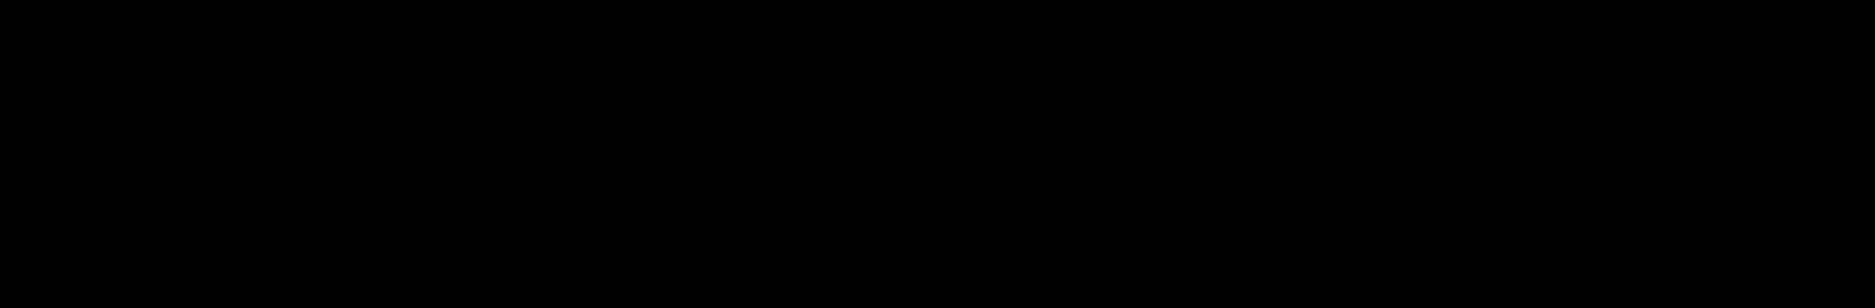 EVA MOREIMI